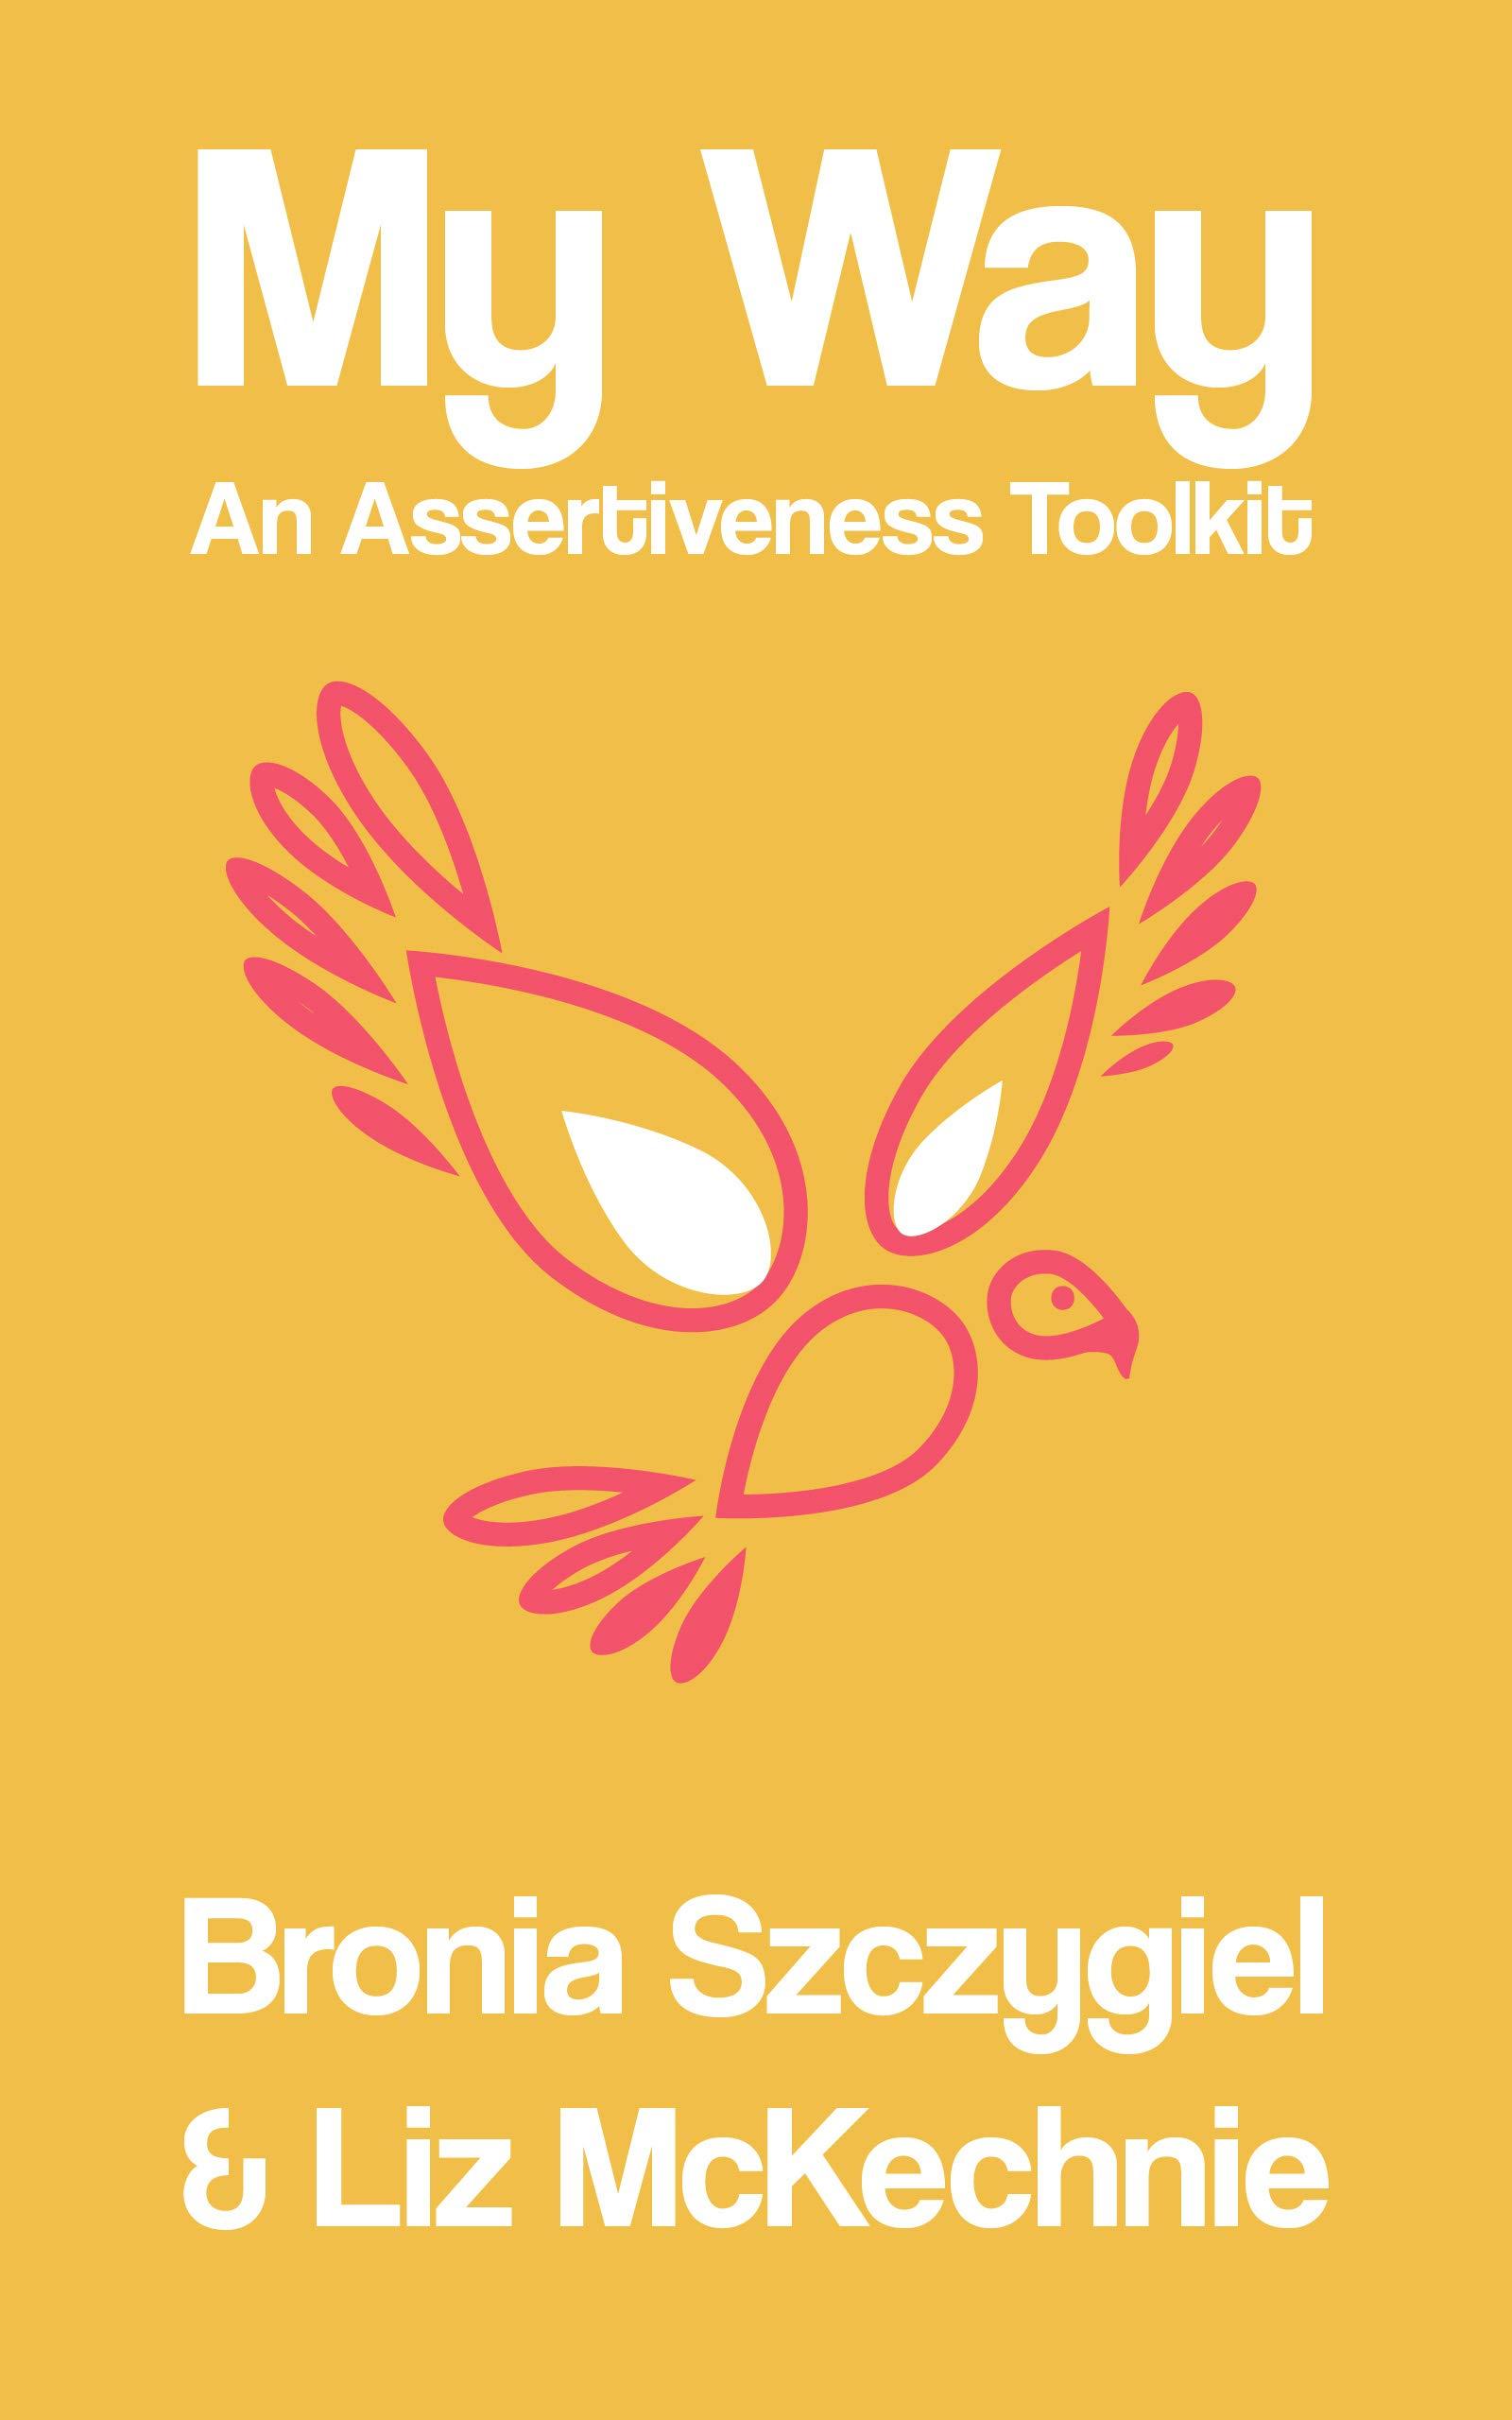 My Way - An Assertiveness Toolkit (Aspire Leadership Toolkit Book 1)